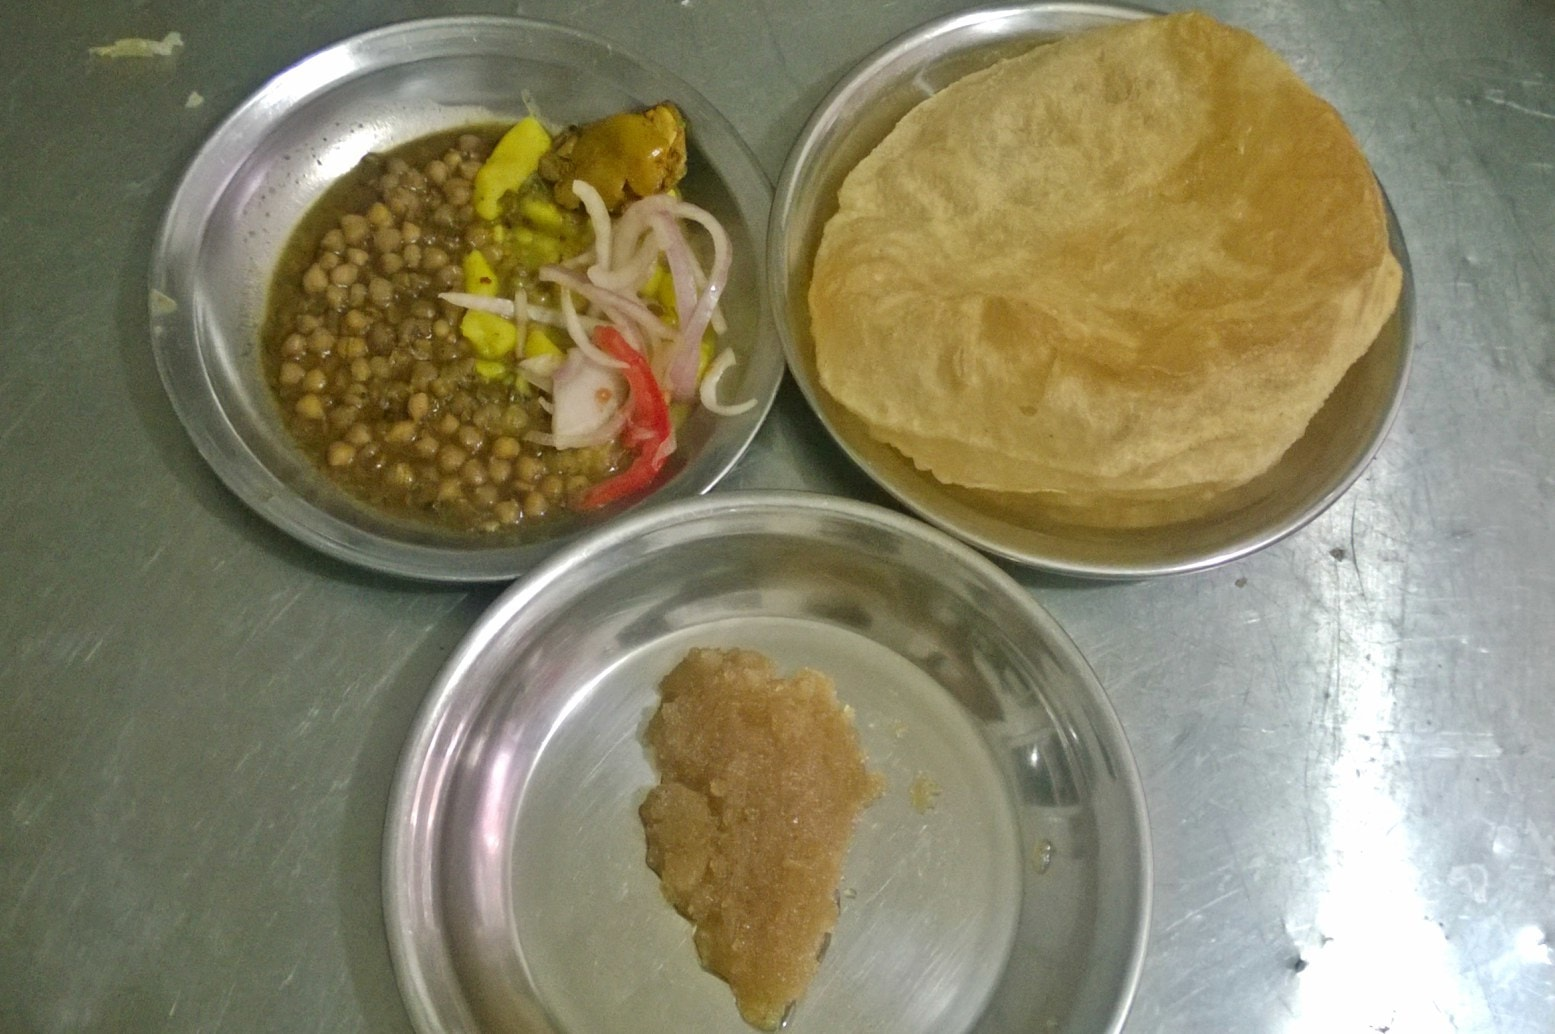 The halwa puri at Shaabu wasn't the best